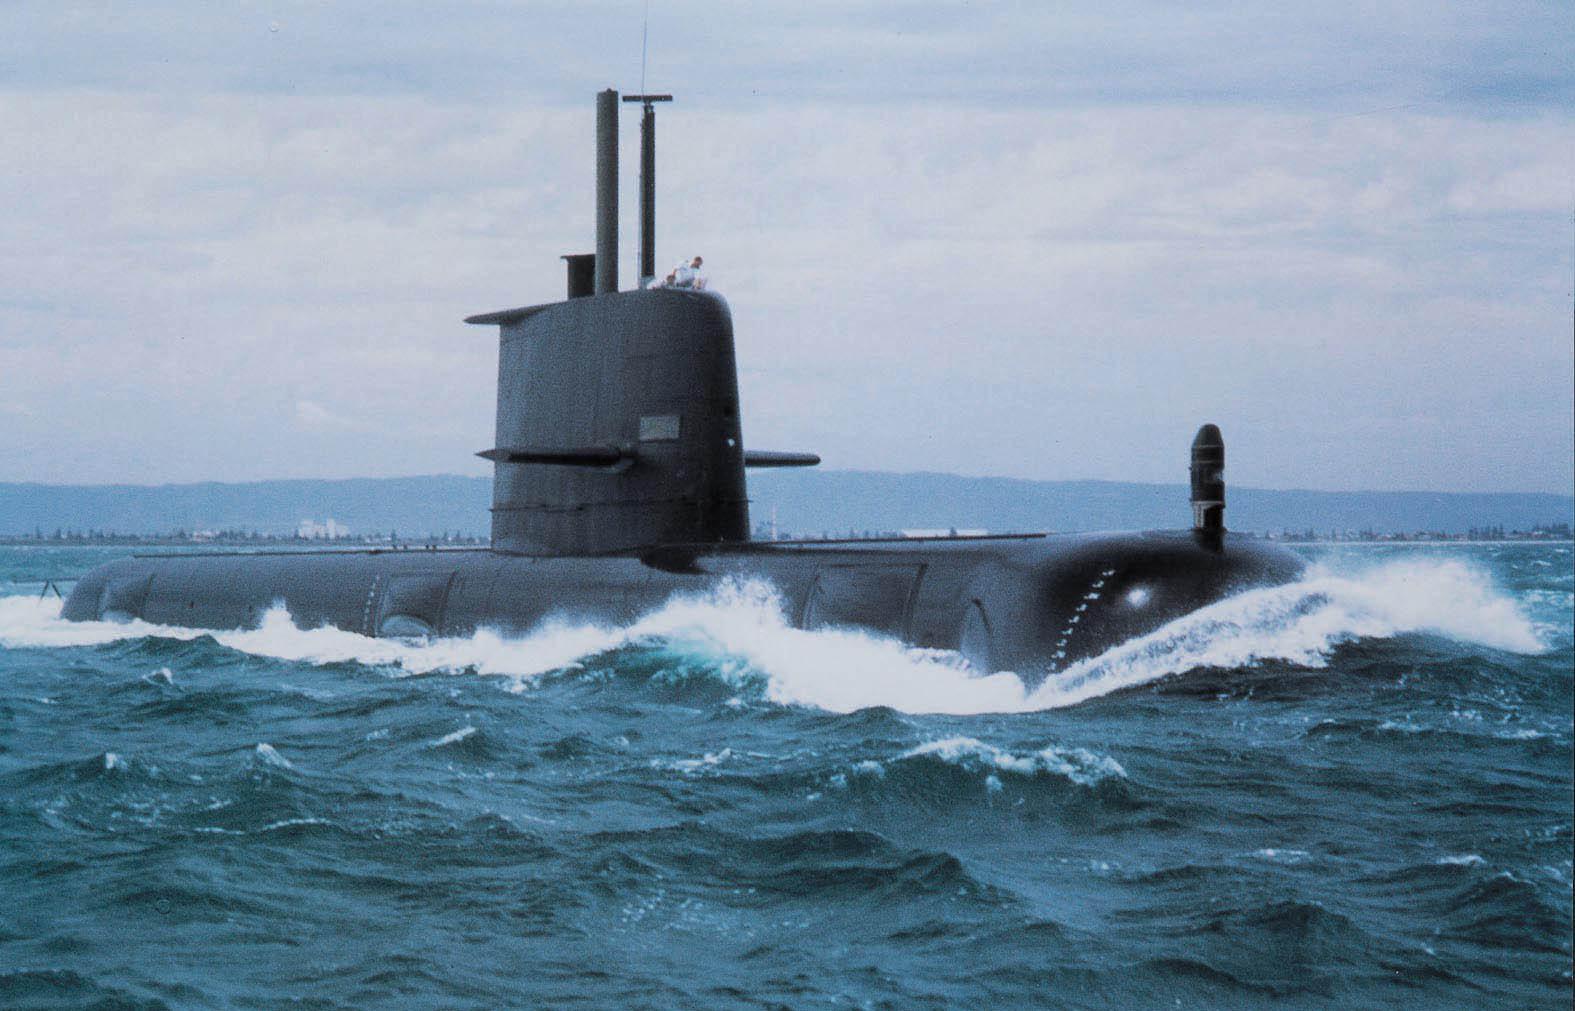 Naval Open Source INTelligence: Future submarines ...